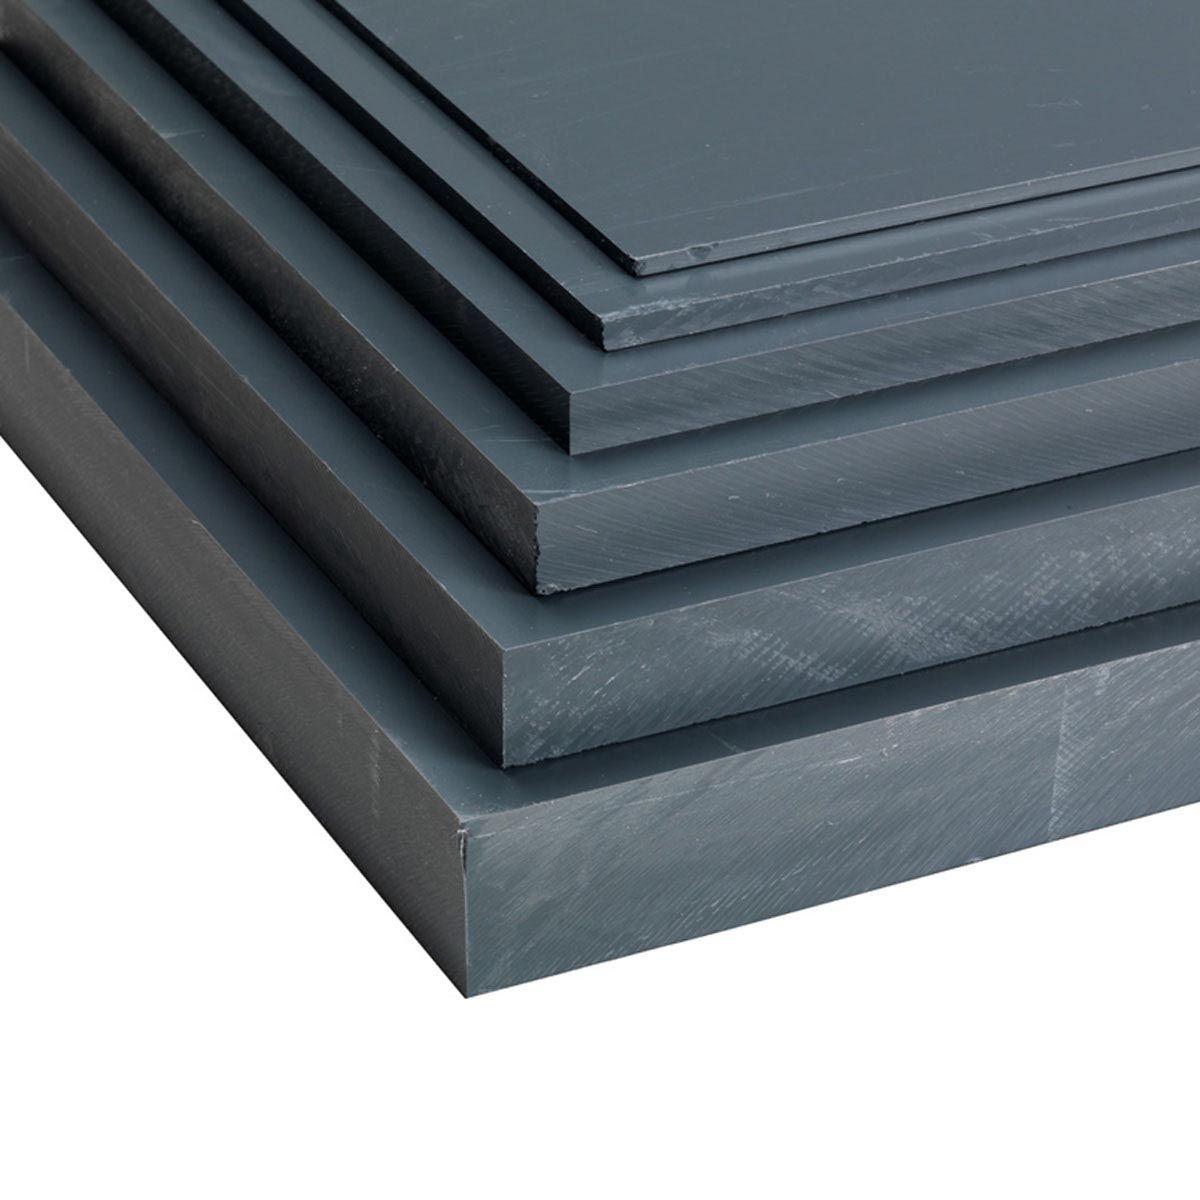 Plaque en PVC, en PVC-U, gris foncé, 2000 x 1000 x 3 mm, 4.32 kg/m2